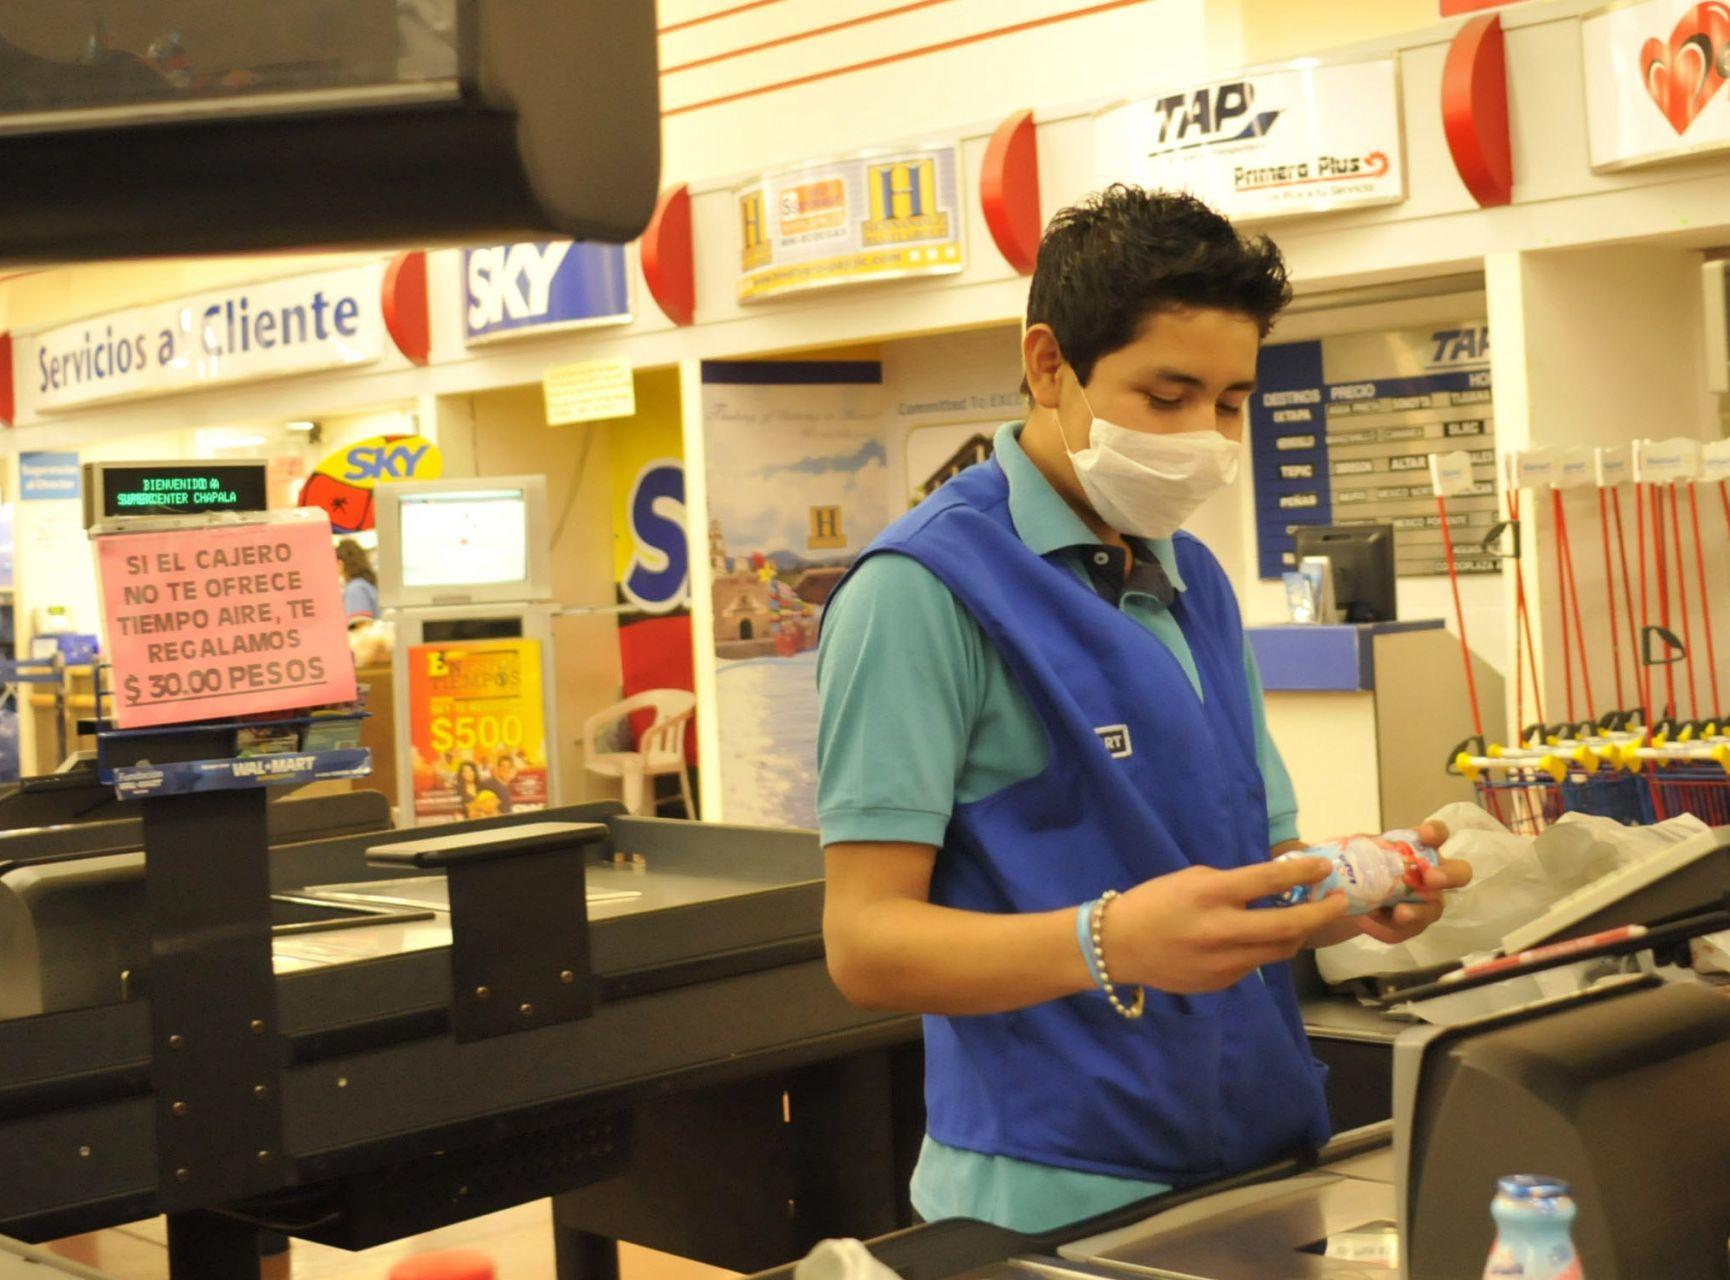 Traz: A partir de mañana en Jalisco será obligatorio el uso de cubrebocas